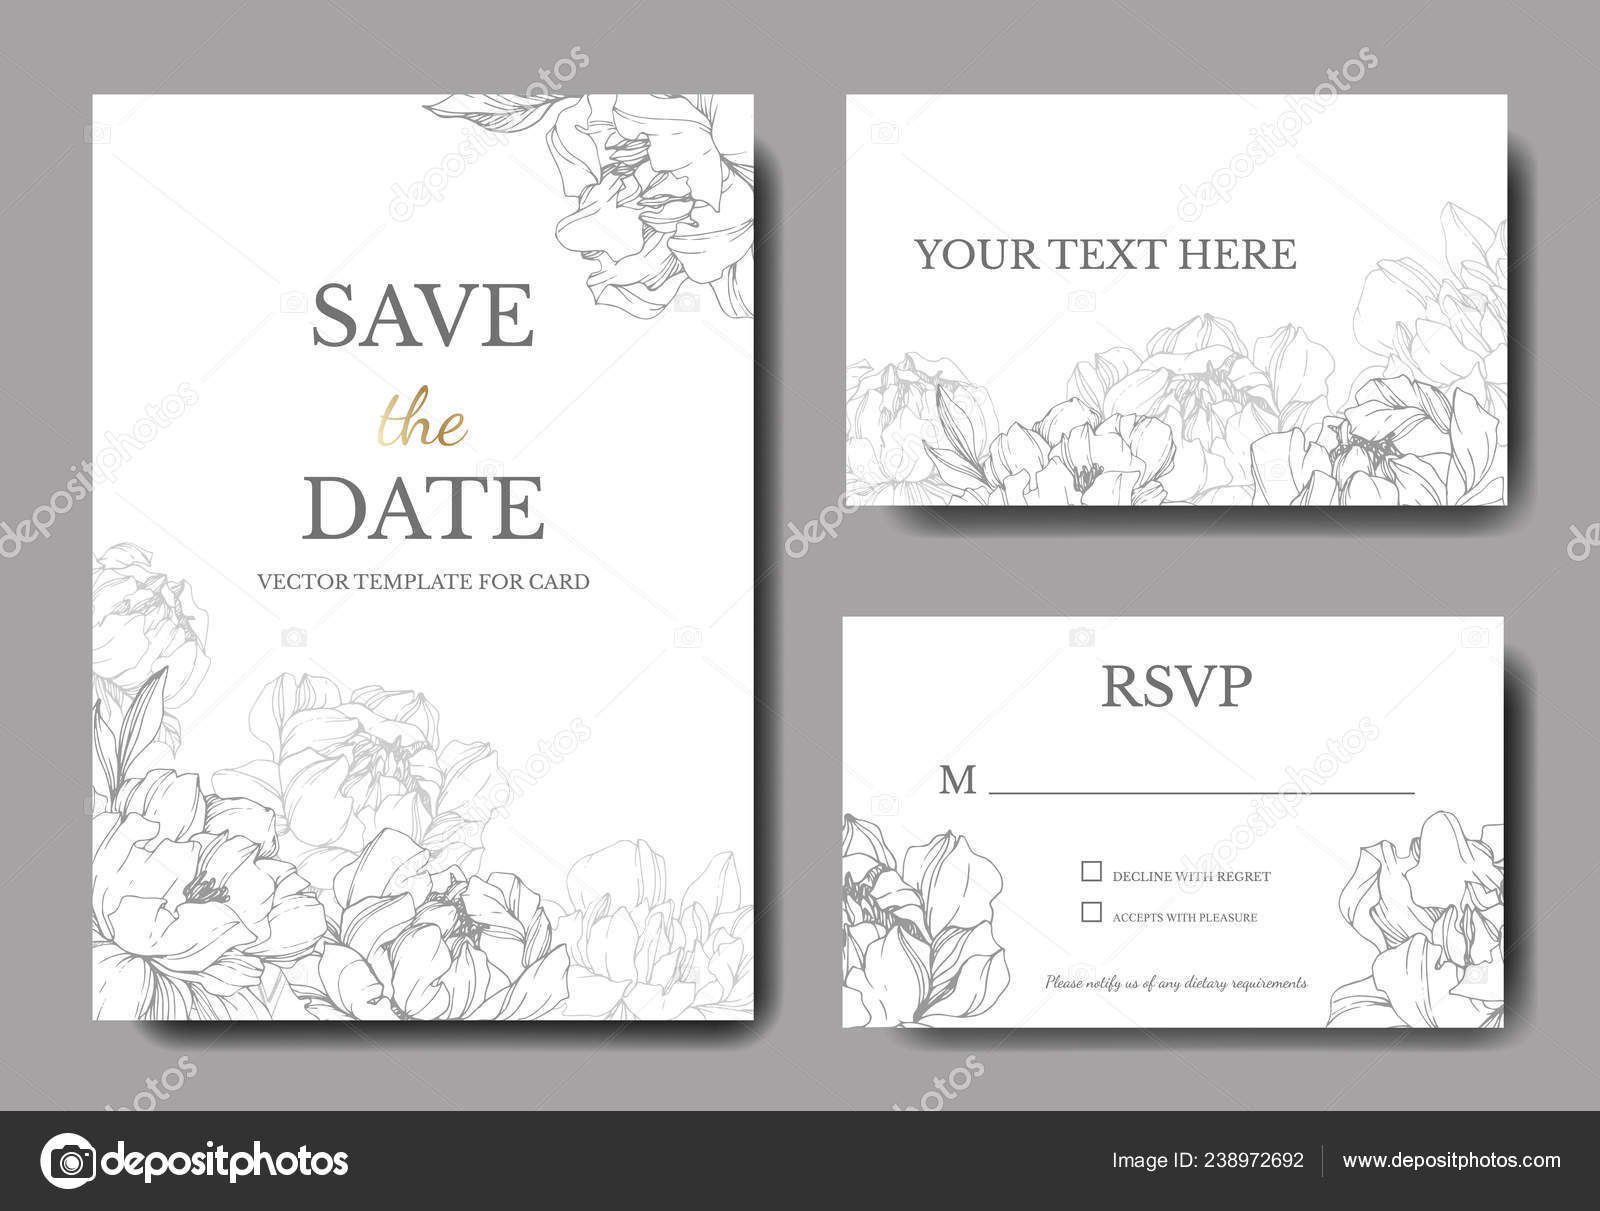 Vector: elegant white backgrounds | Vector Wedding Elegant Invitation Cards  Silver Peonies Illustration White Background — Stock Vector © AndreYanush  #238972692